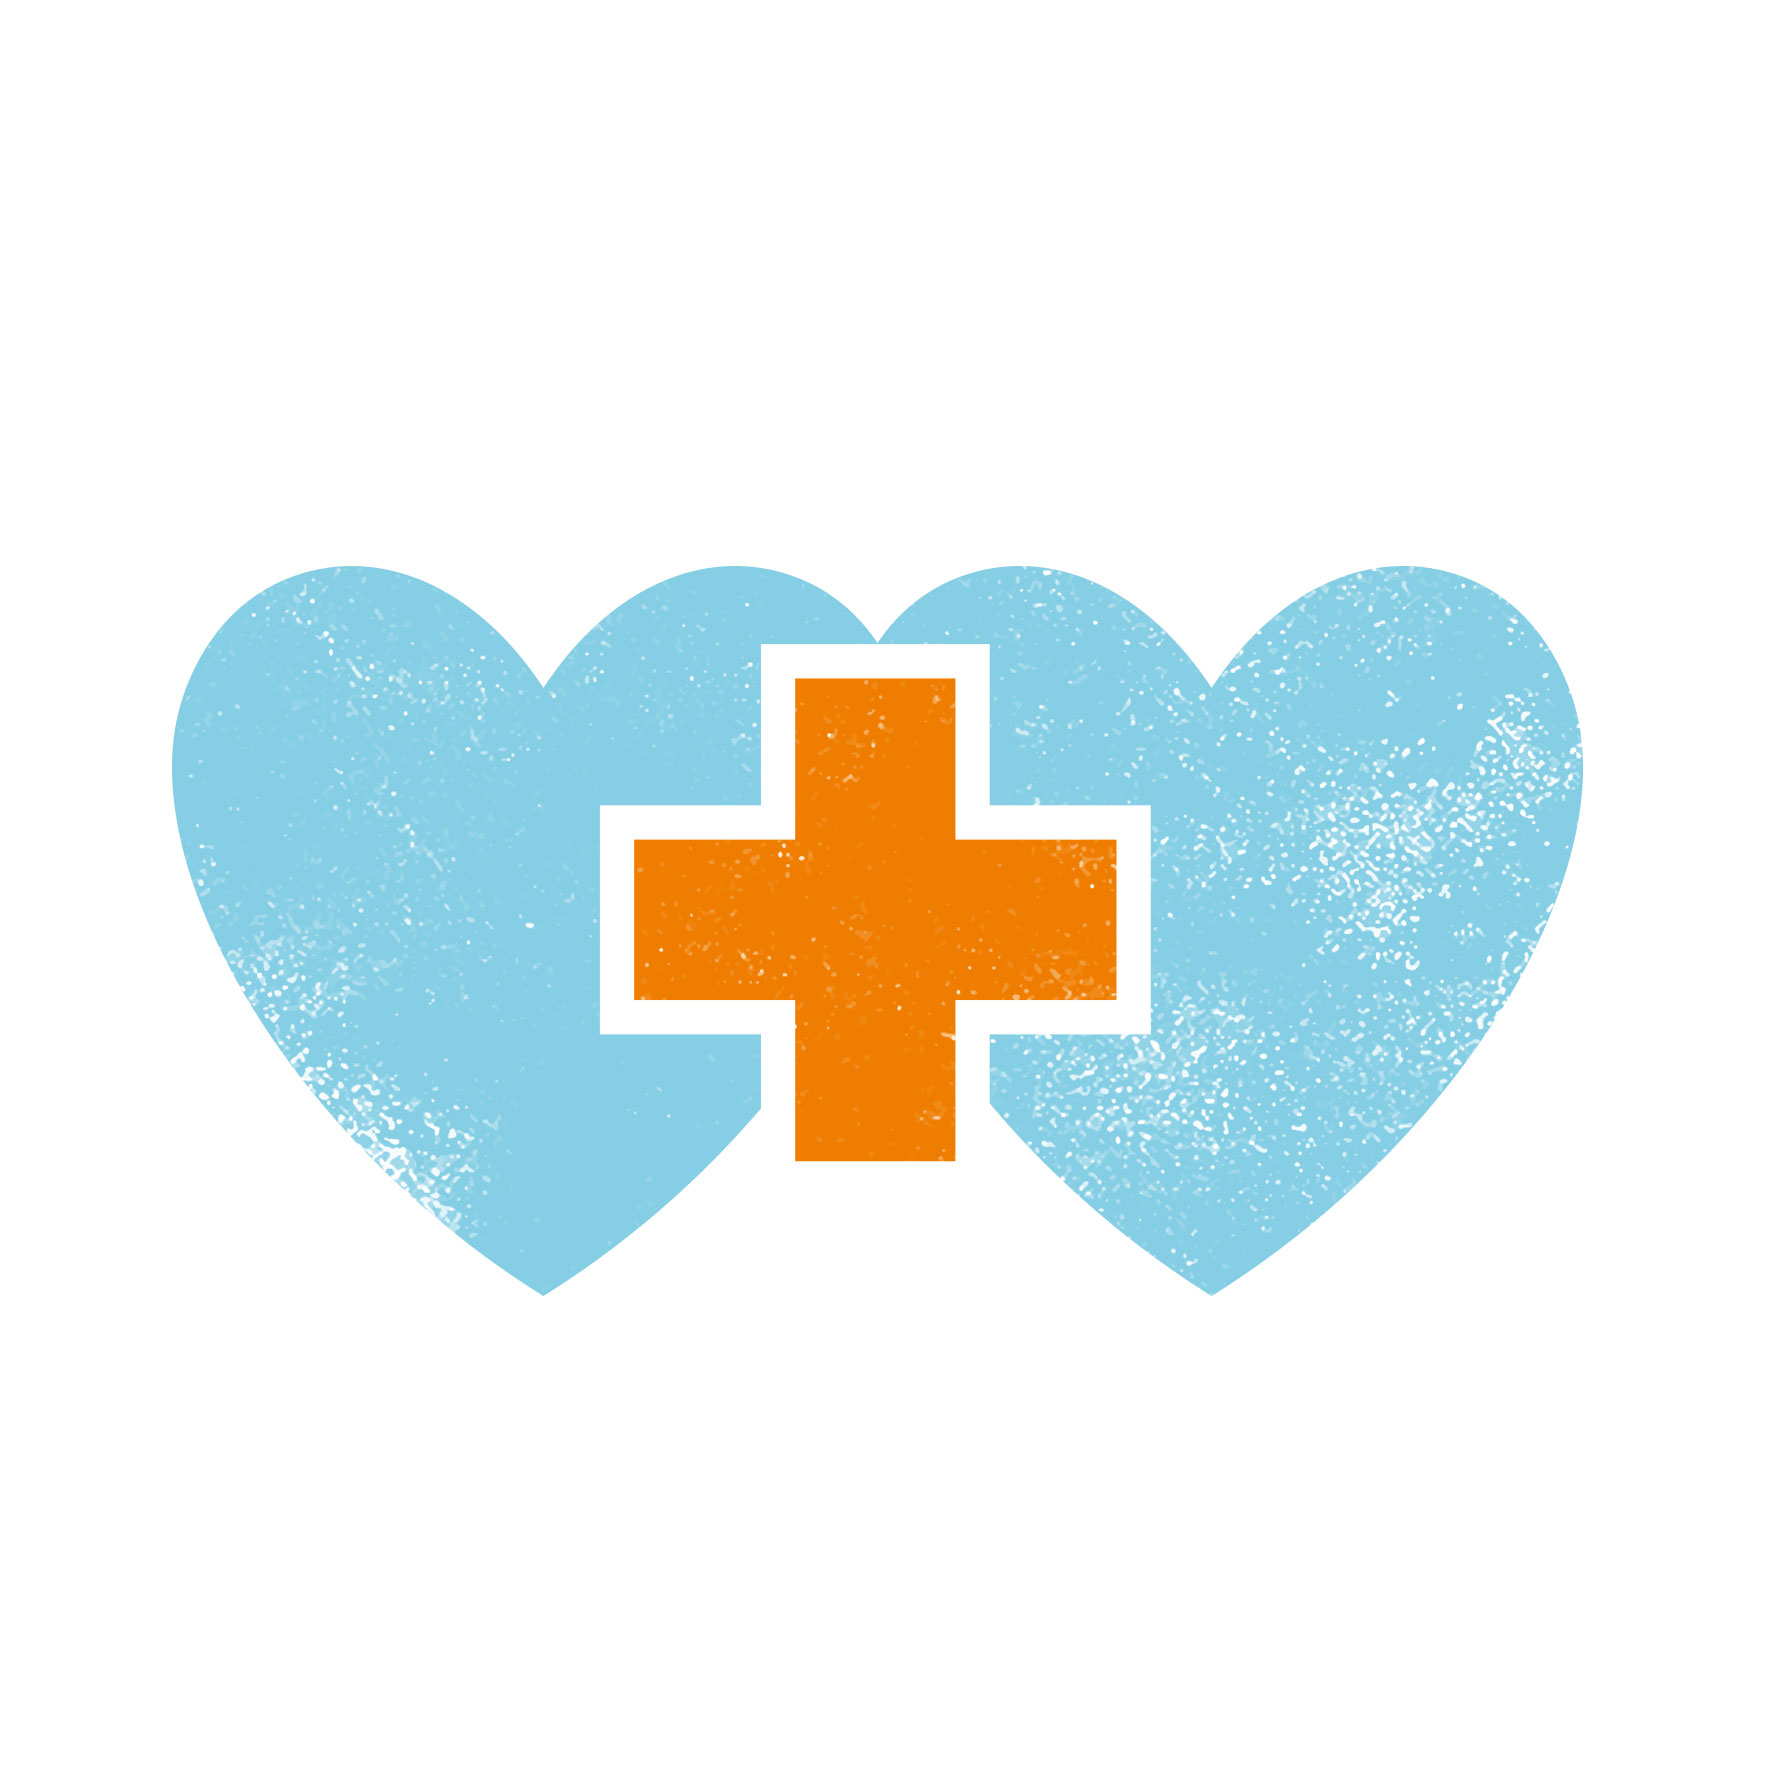 Sexual-reproductive-health-icon.jpg